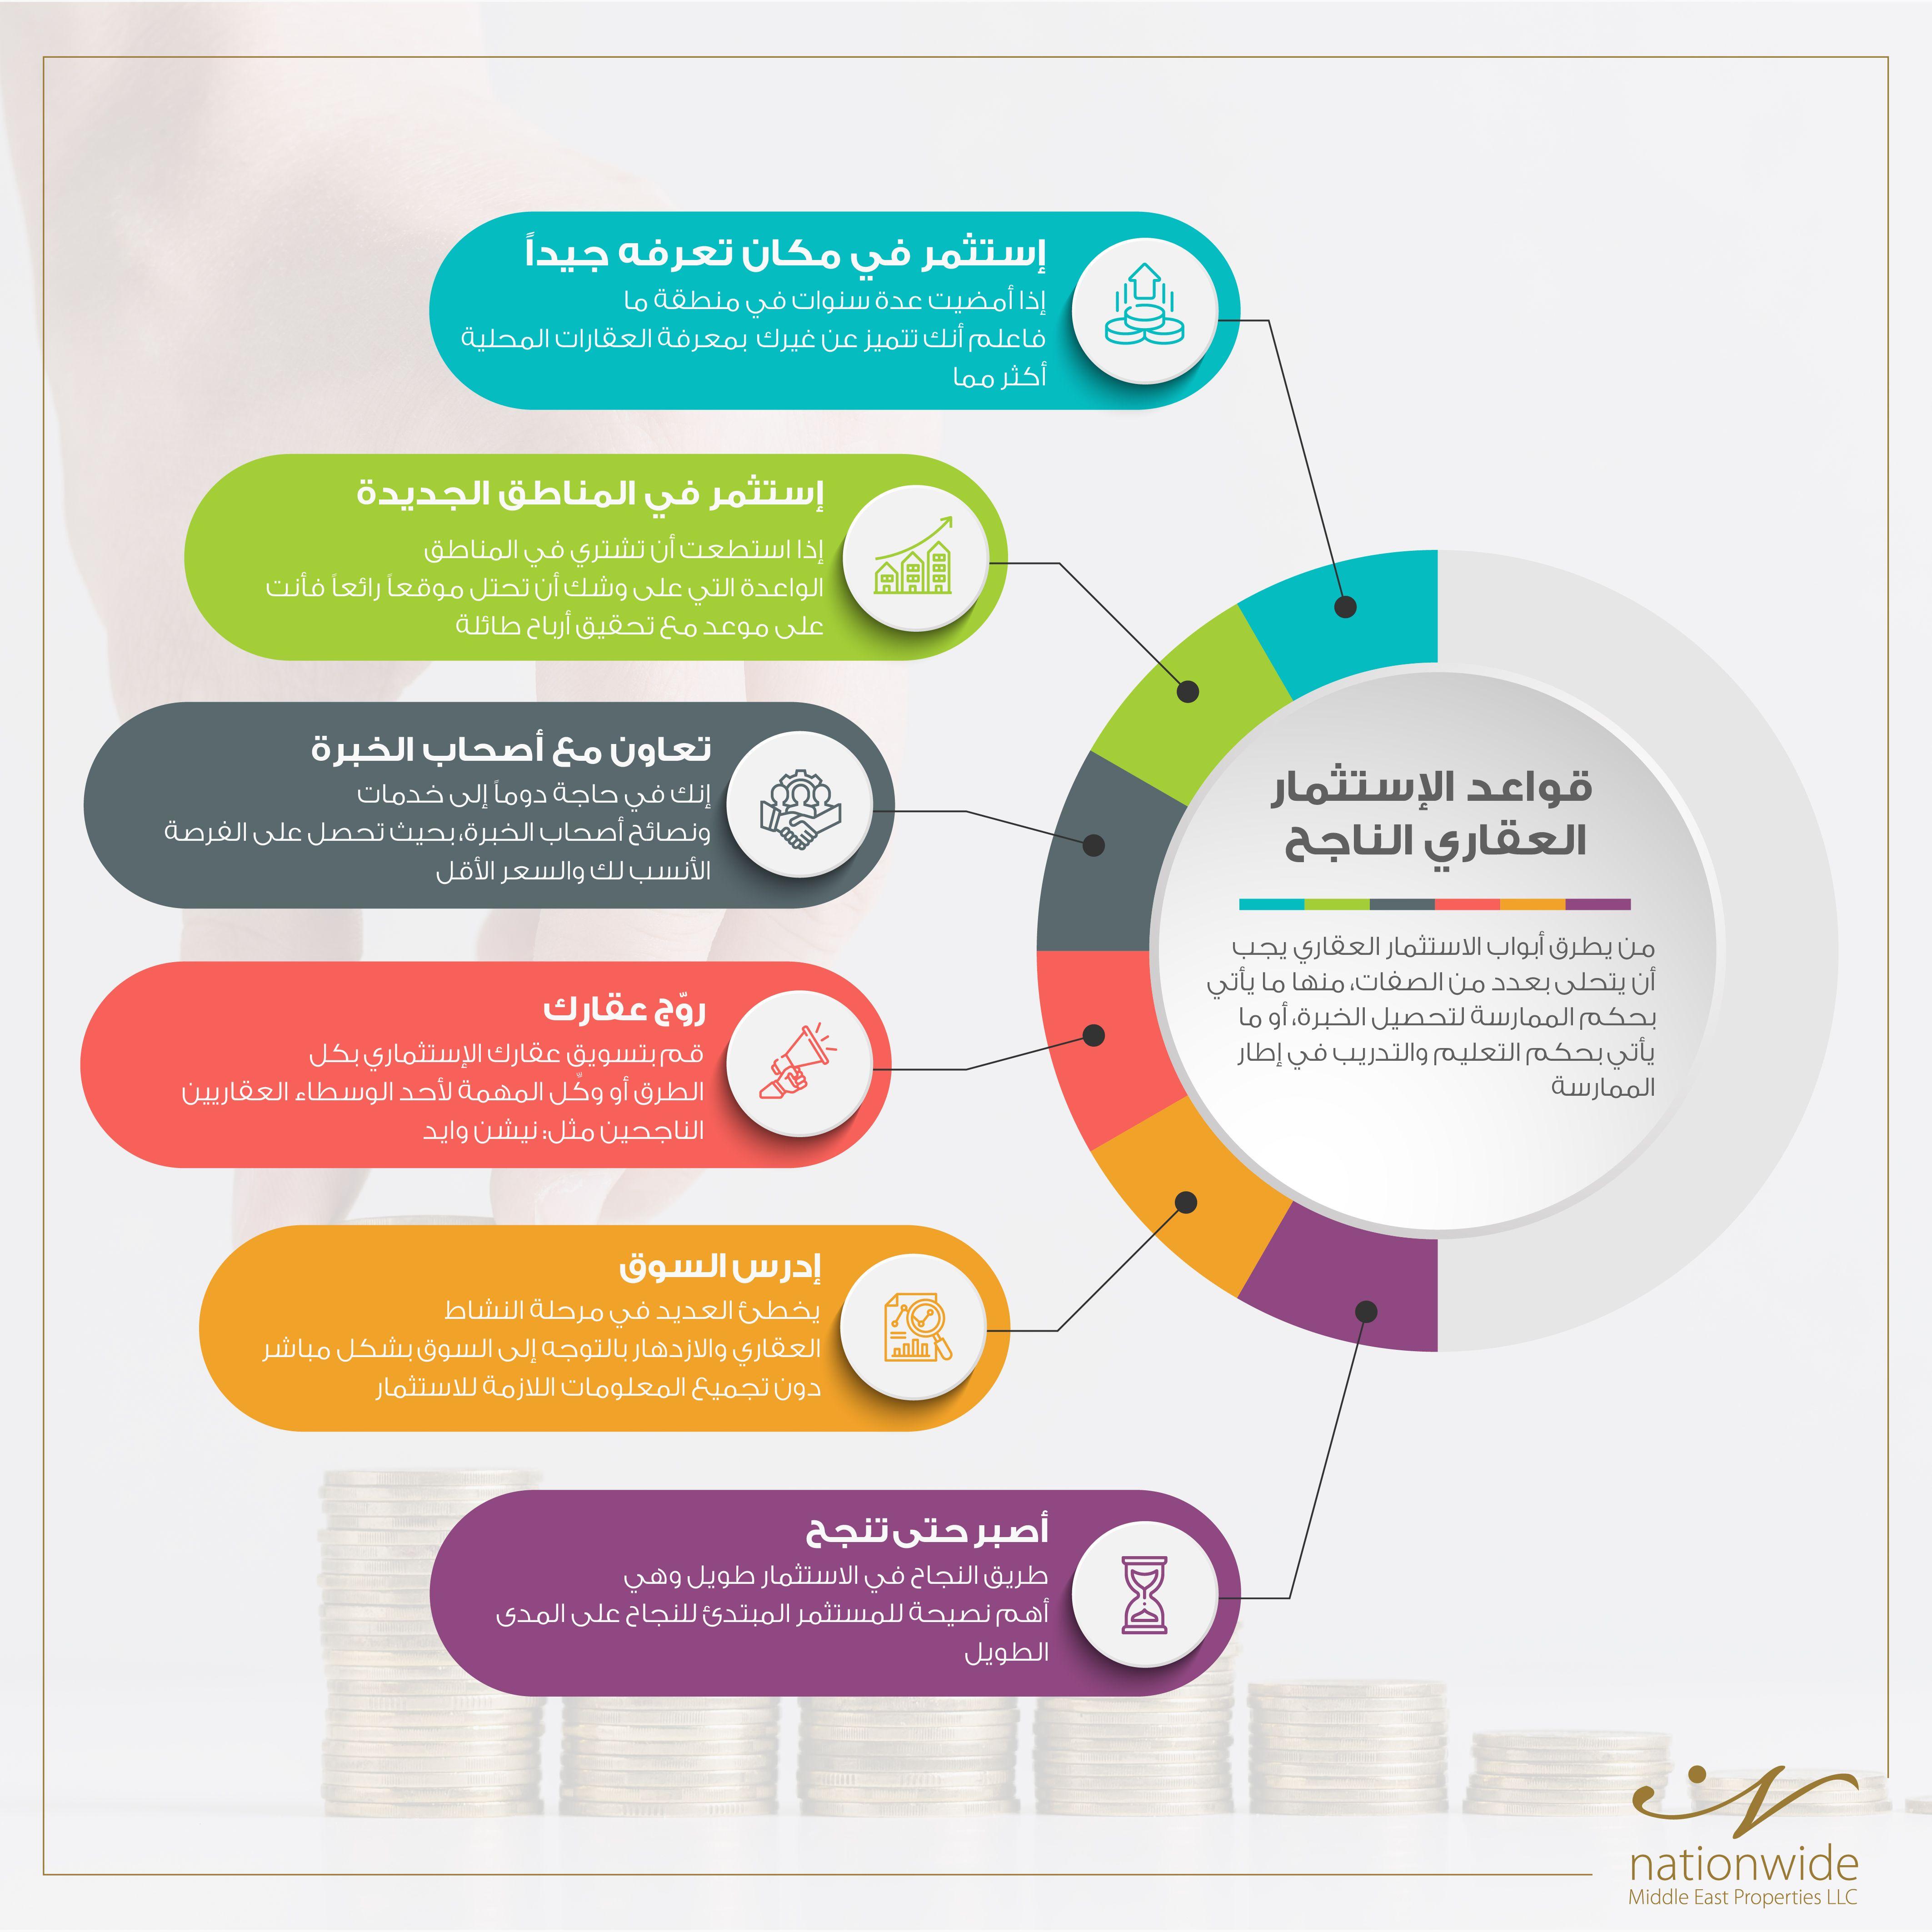 قواعد الاستثمار العقاري الناجح Successful Real Estate Investment Rules Real Estate Agency Nationwide Solutions